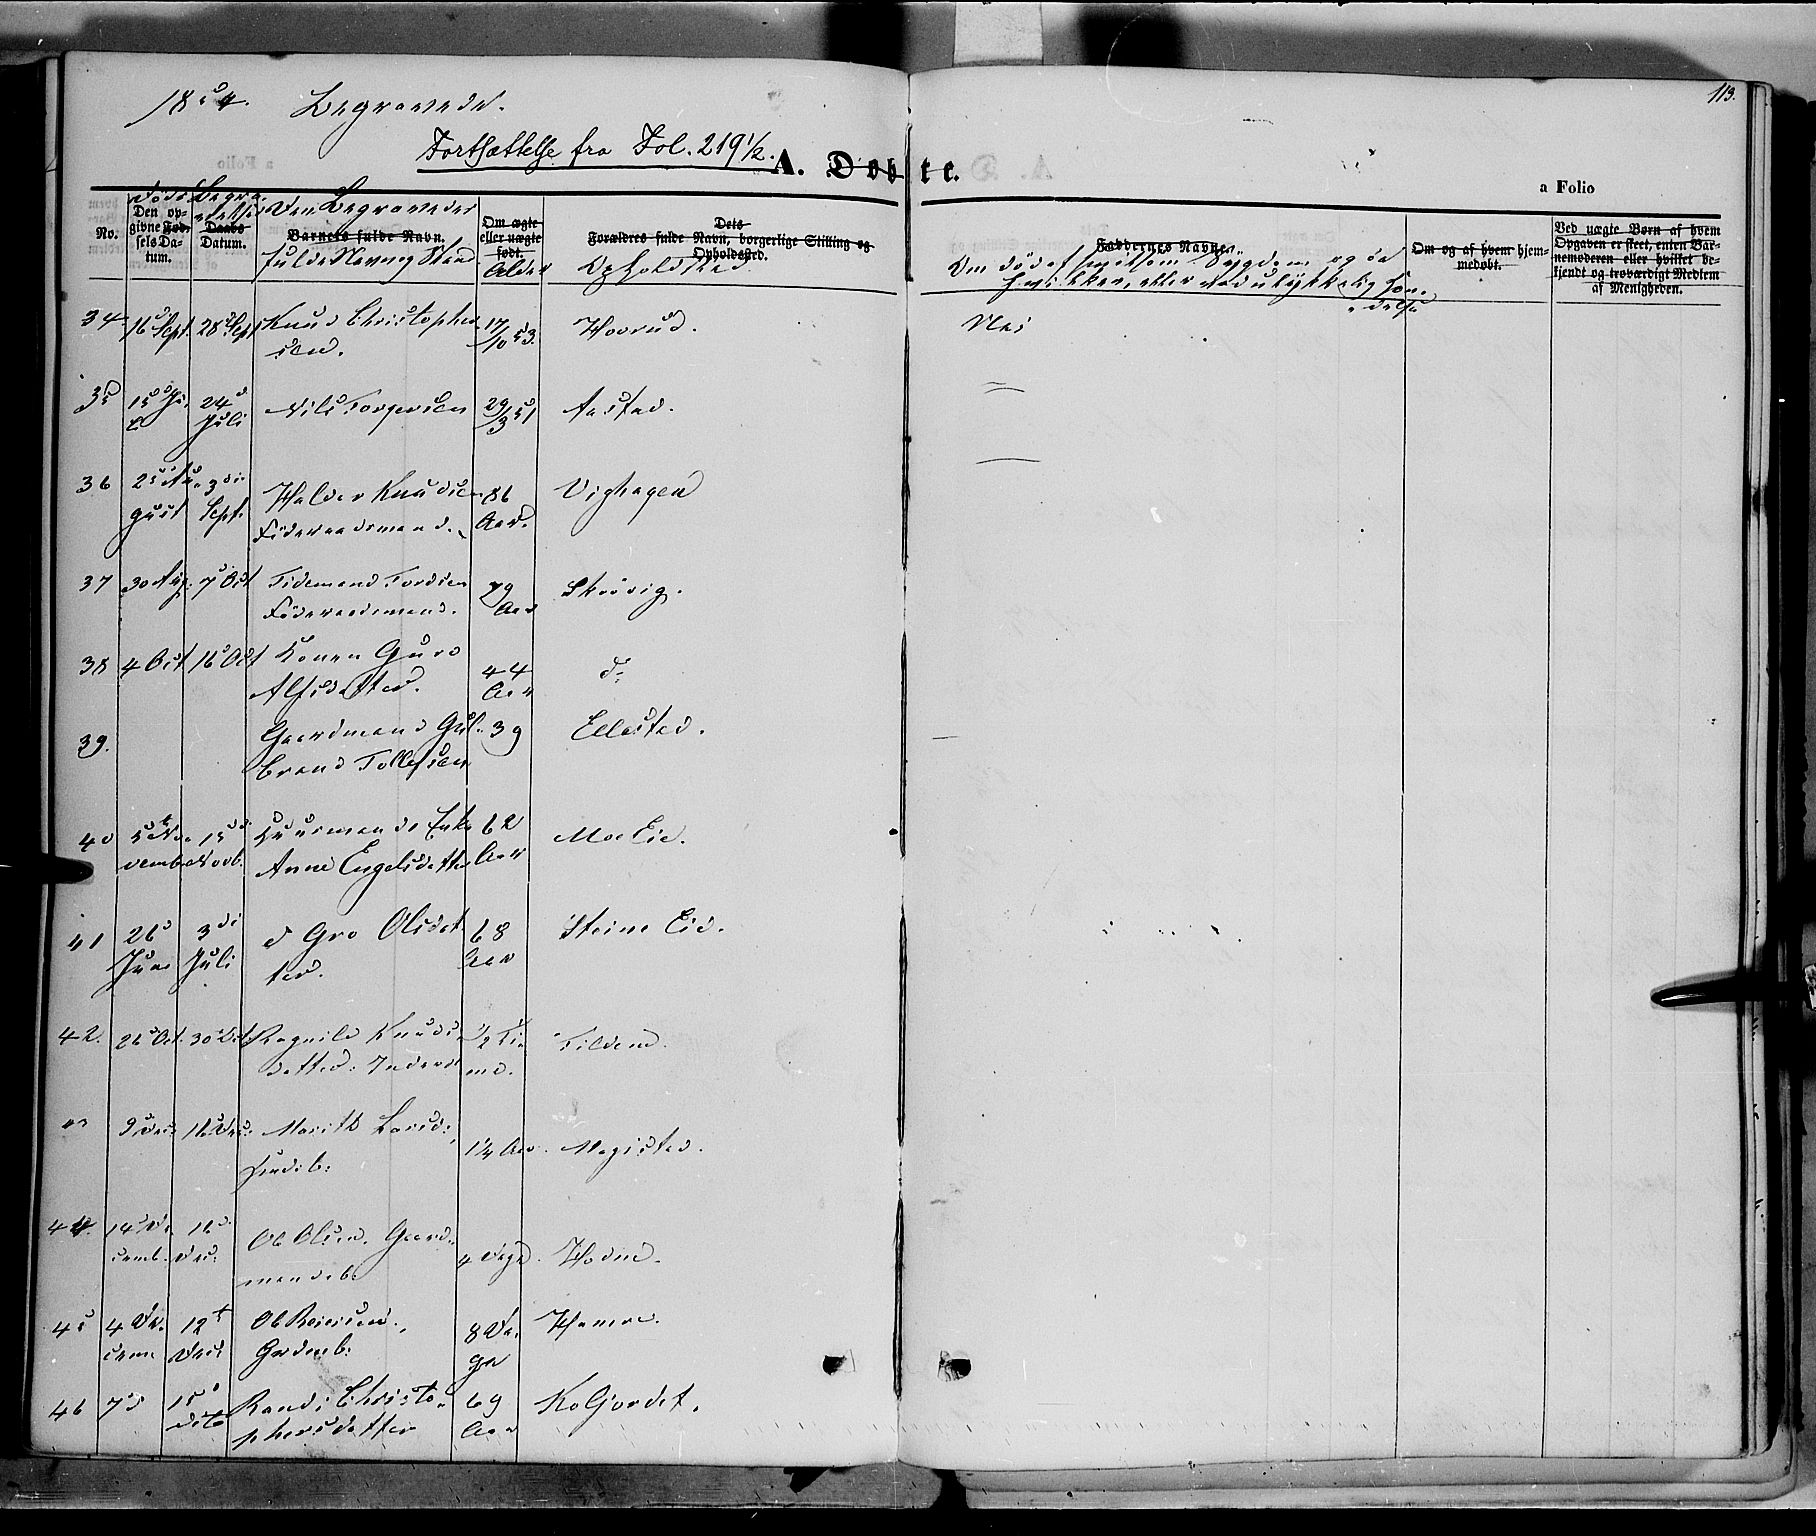 SAH, Vestre Slidre prestekontor, Ministerialbok nr. 1, 1844-1855, s. 113